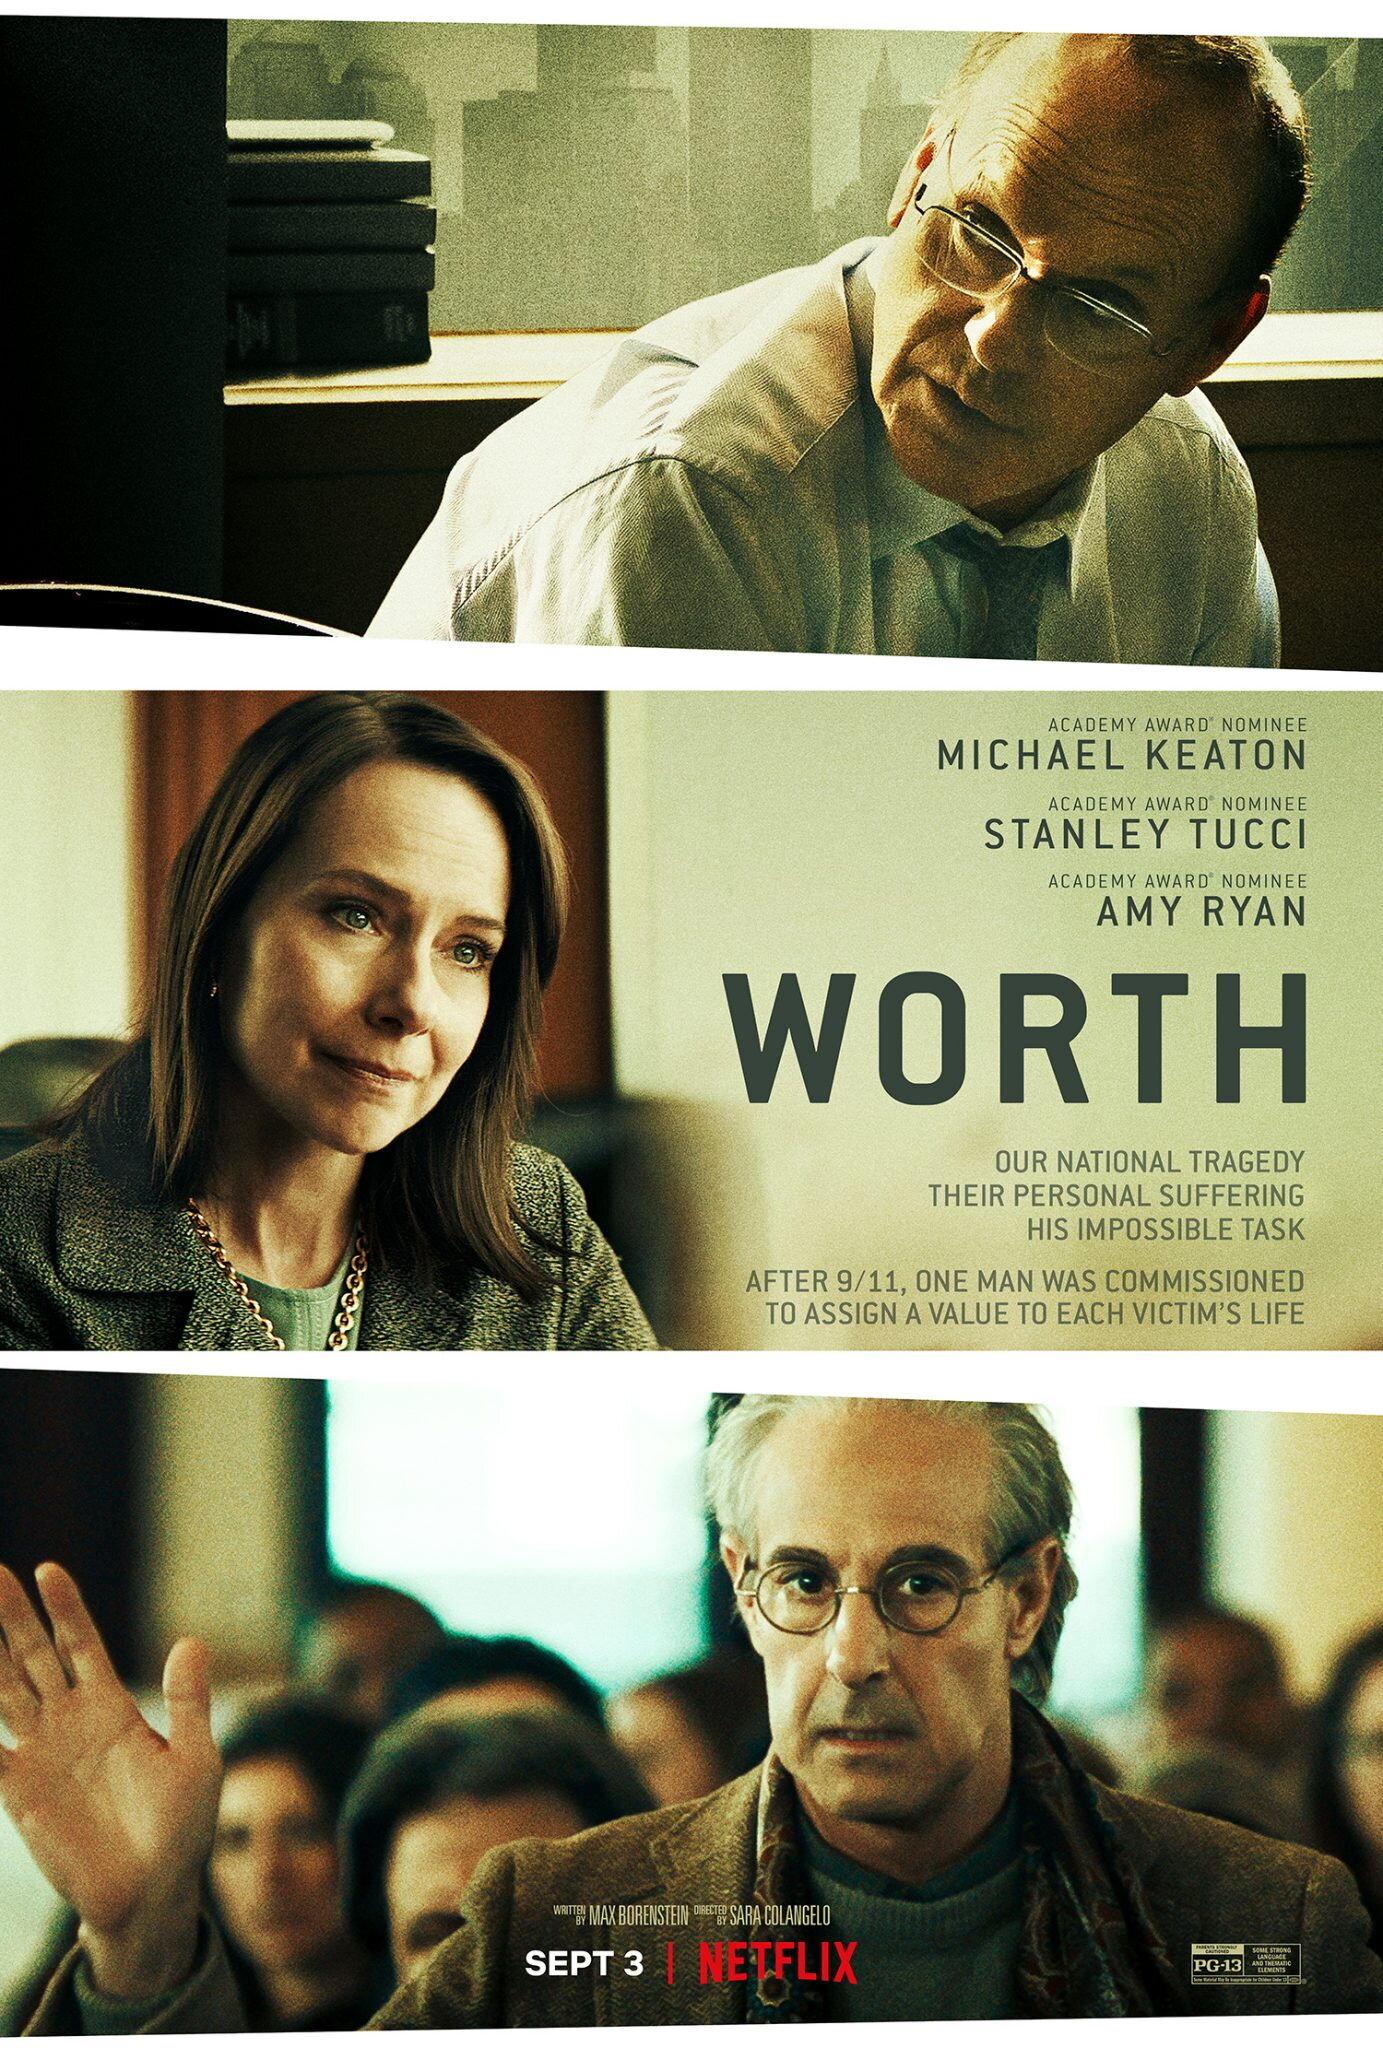 Download Worth (2020) Bengali Dubbed (Voice Over) WEBRip 720p [Full Movie] 1XBET FREE on 1XCinema.com & KatMovieHD.sk